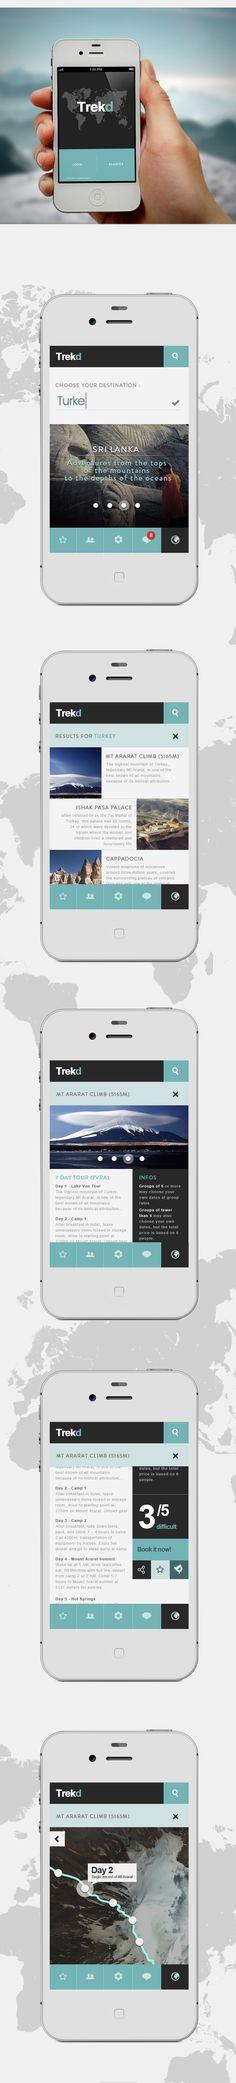 #mobile #app #ui